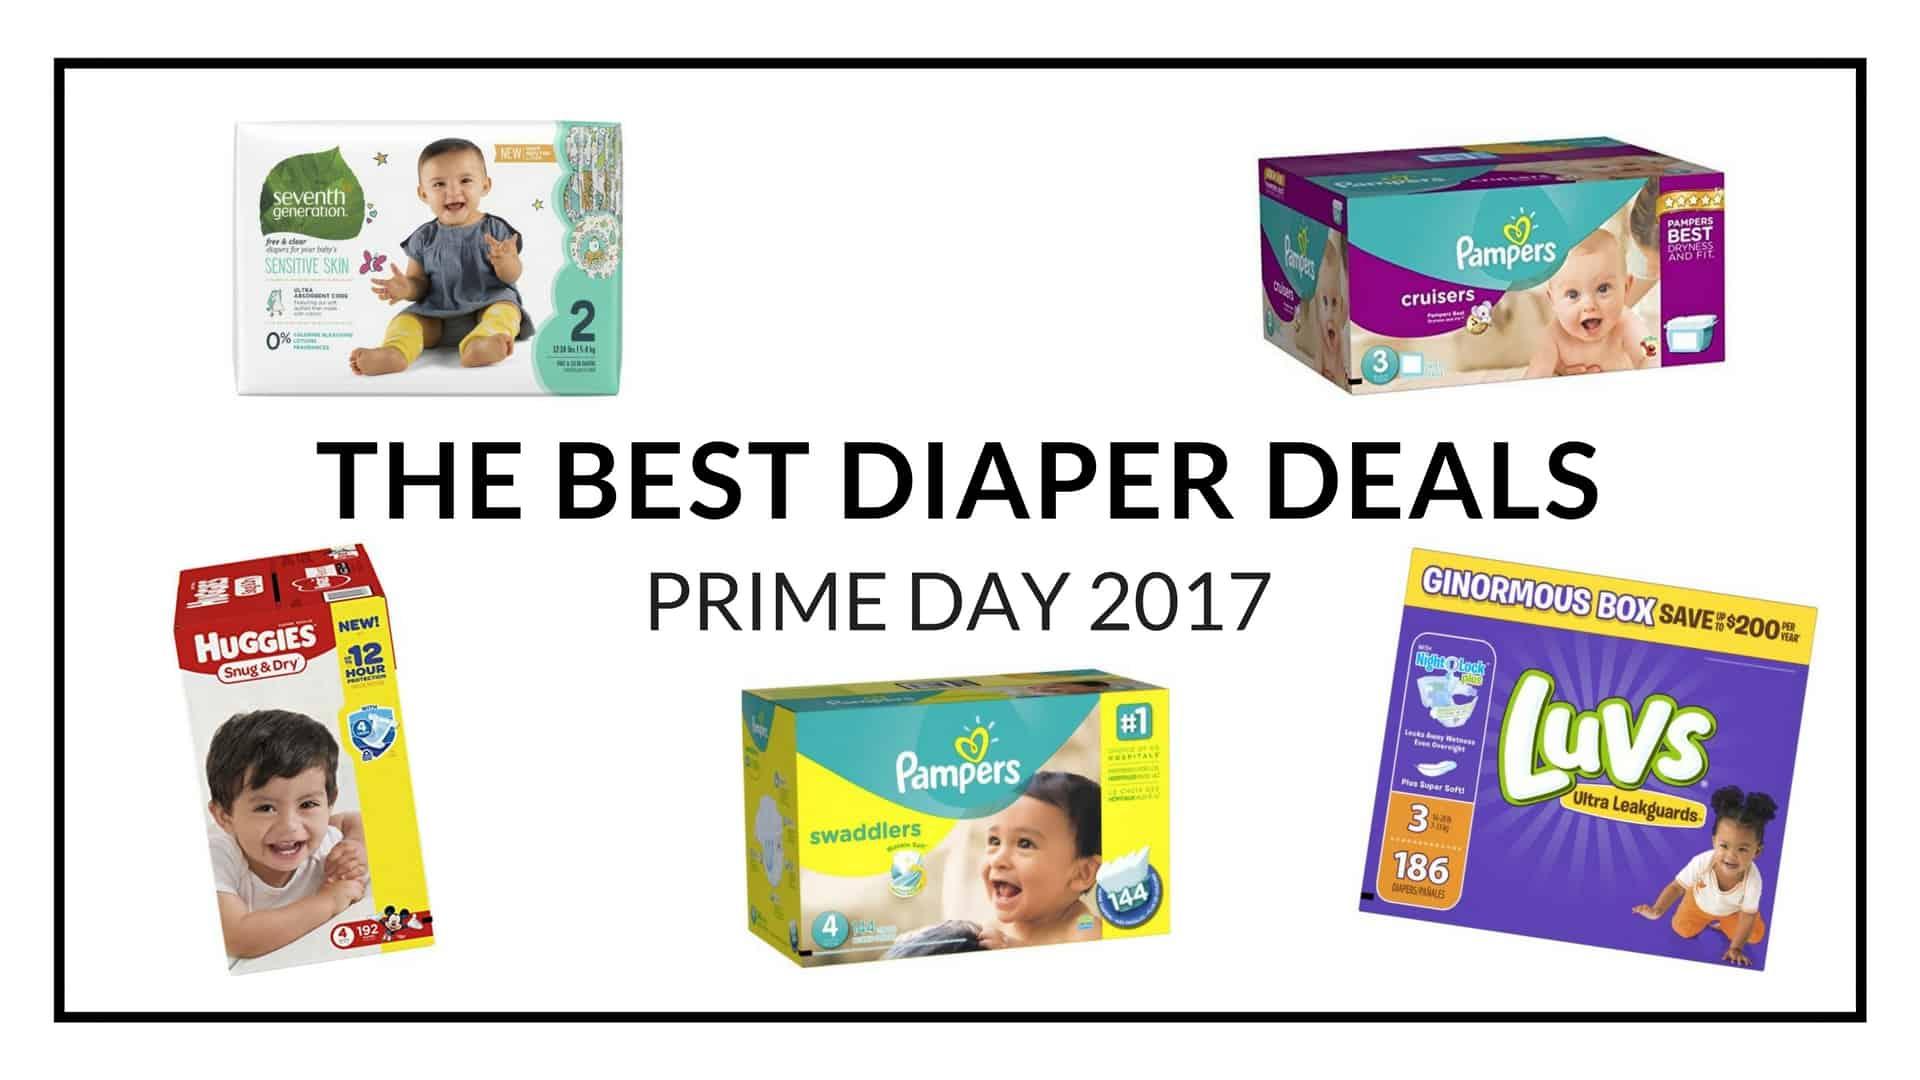 Prime Day 2017 Diaper Deals